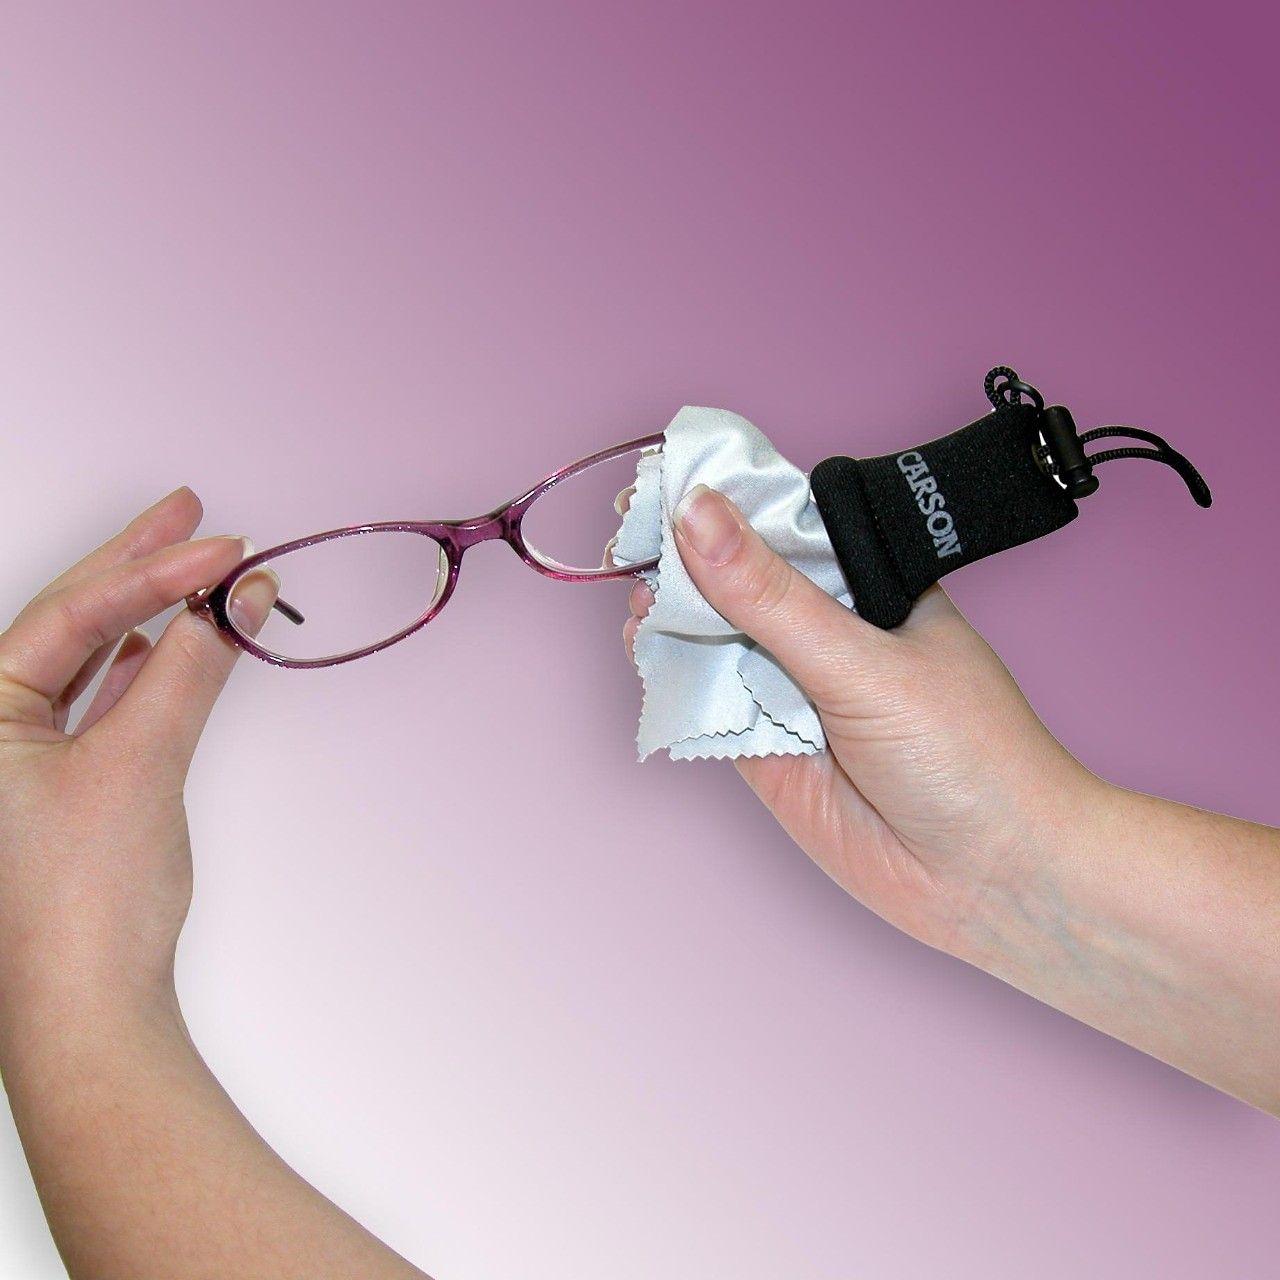 How to clean Eyeglasses properly? Lenses on the eye